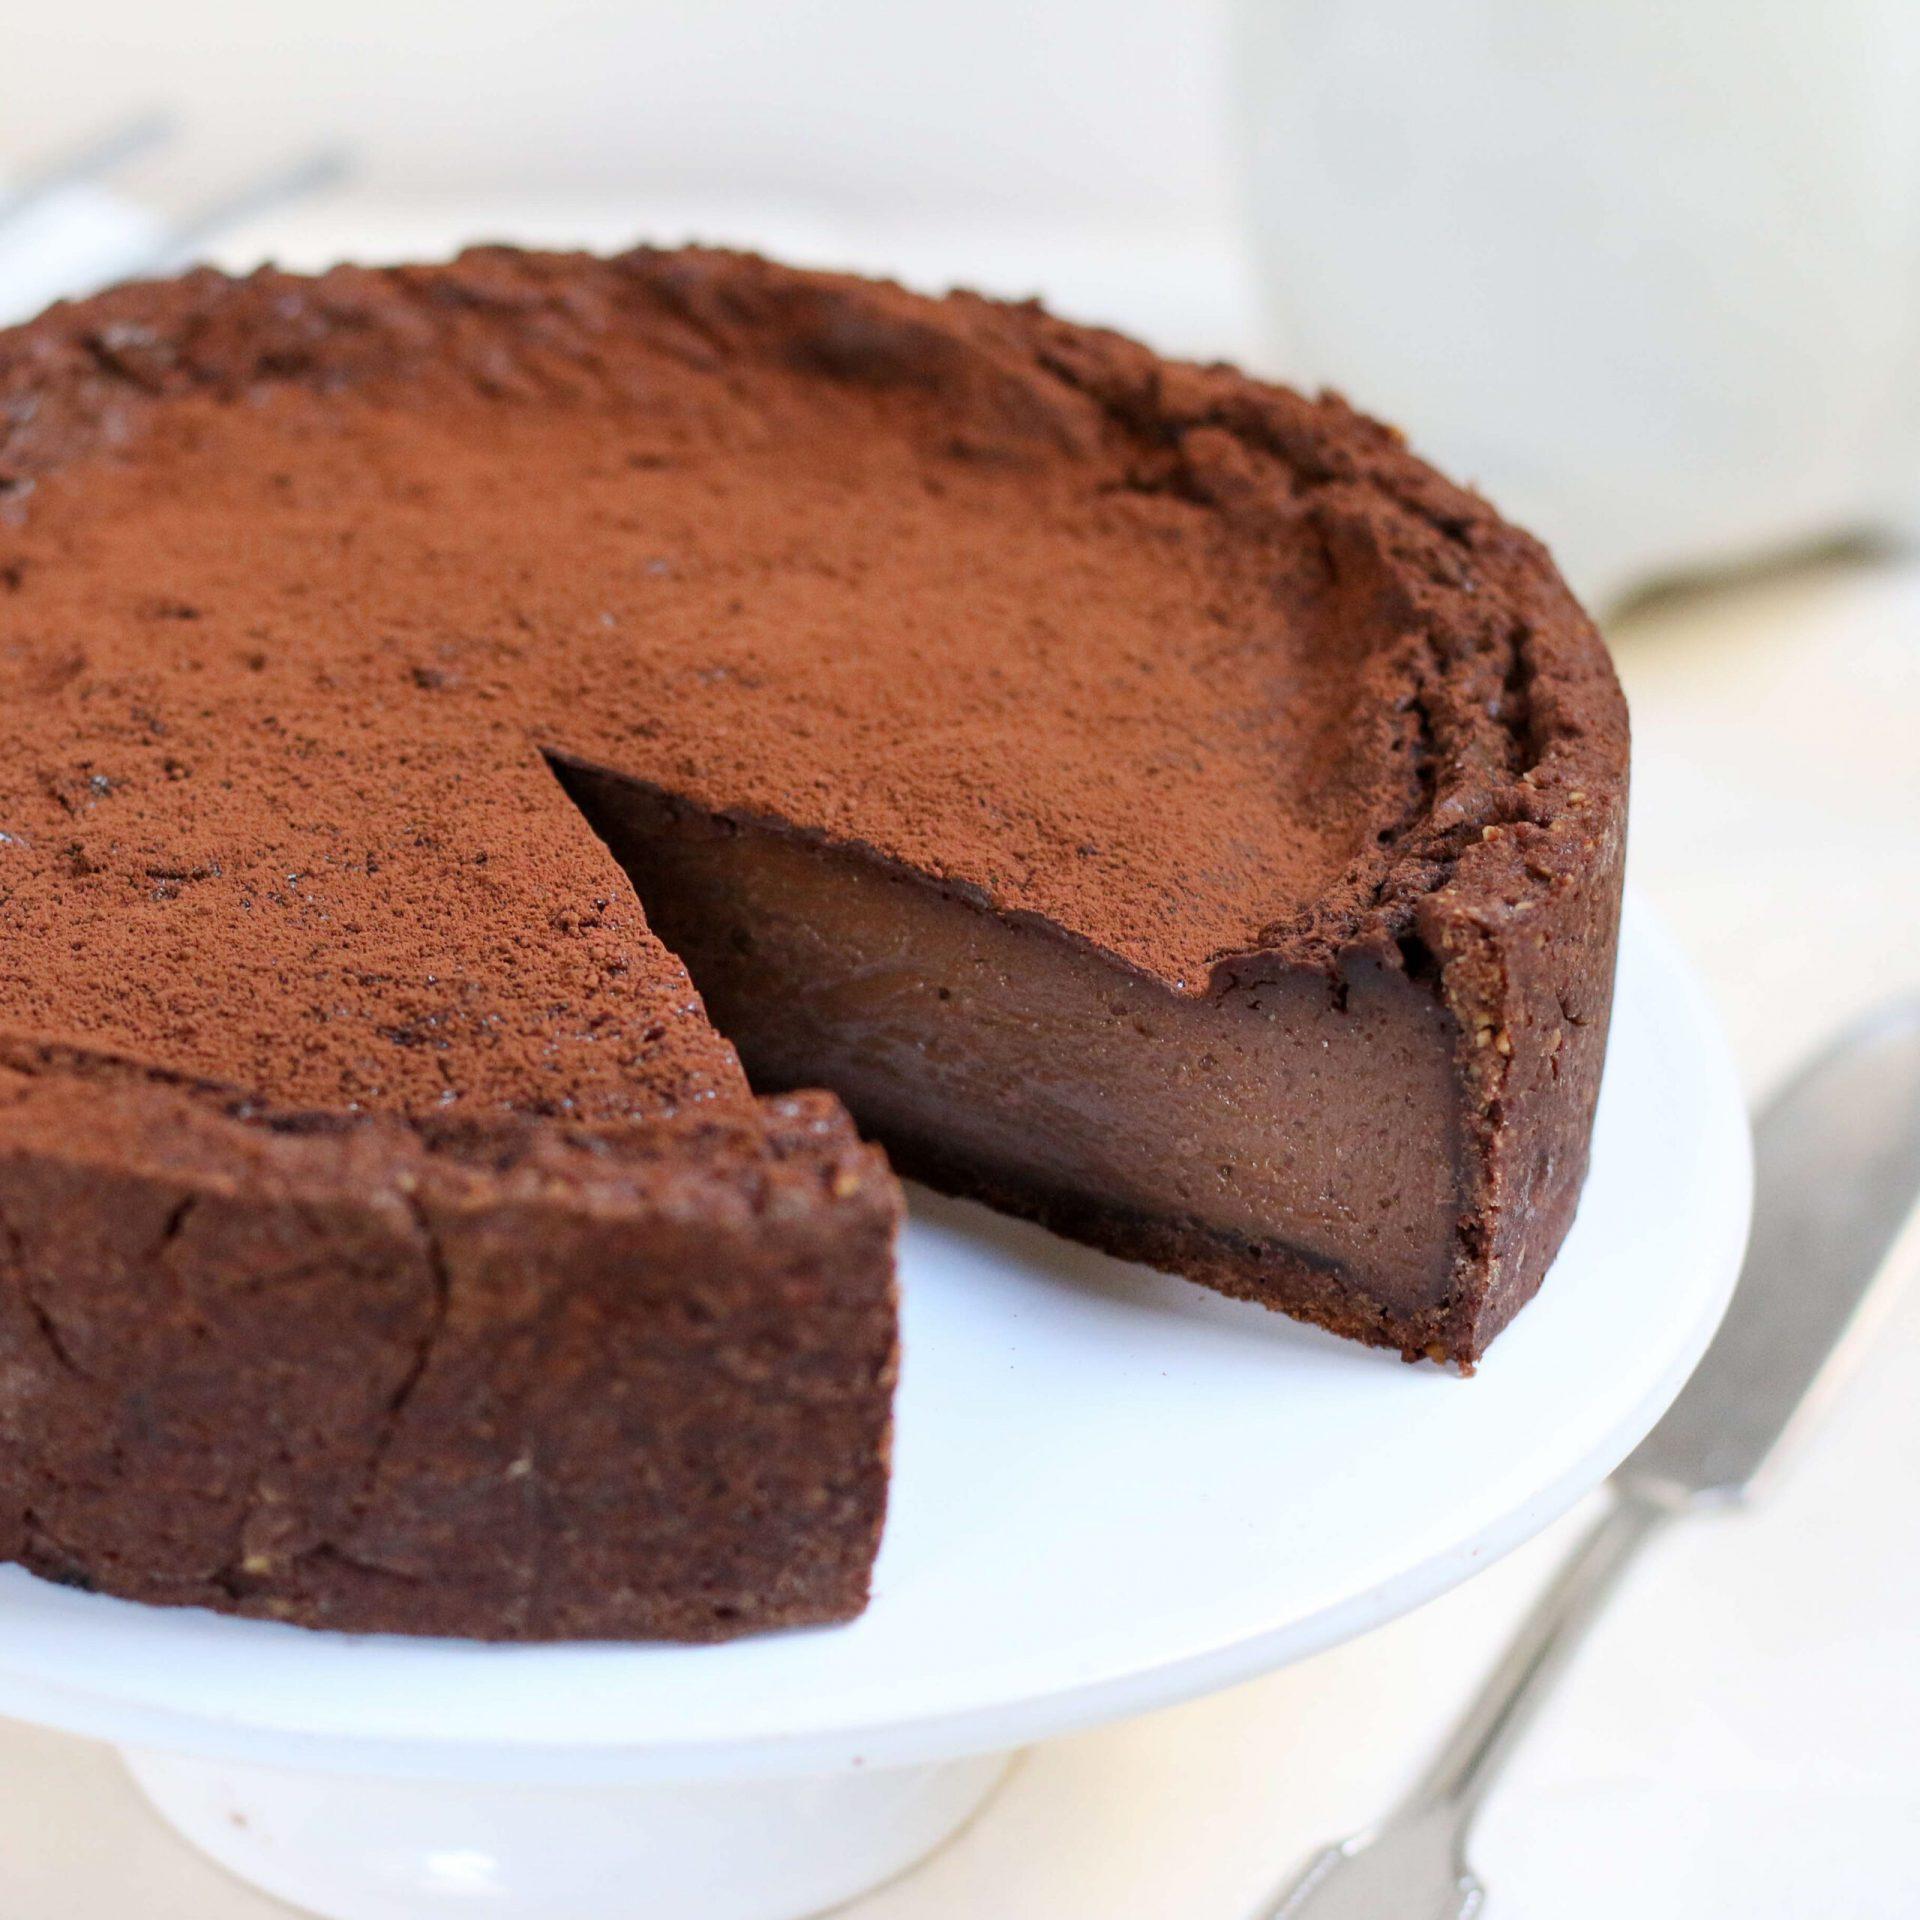 Chocolate flan